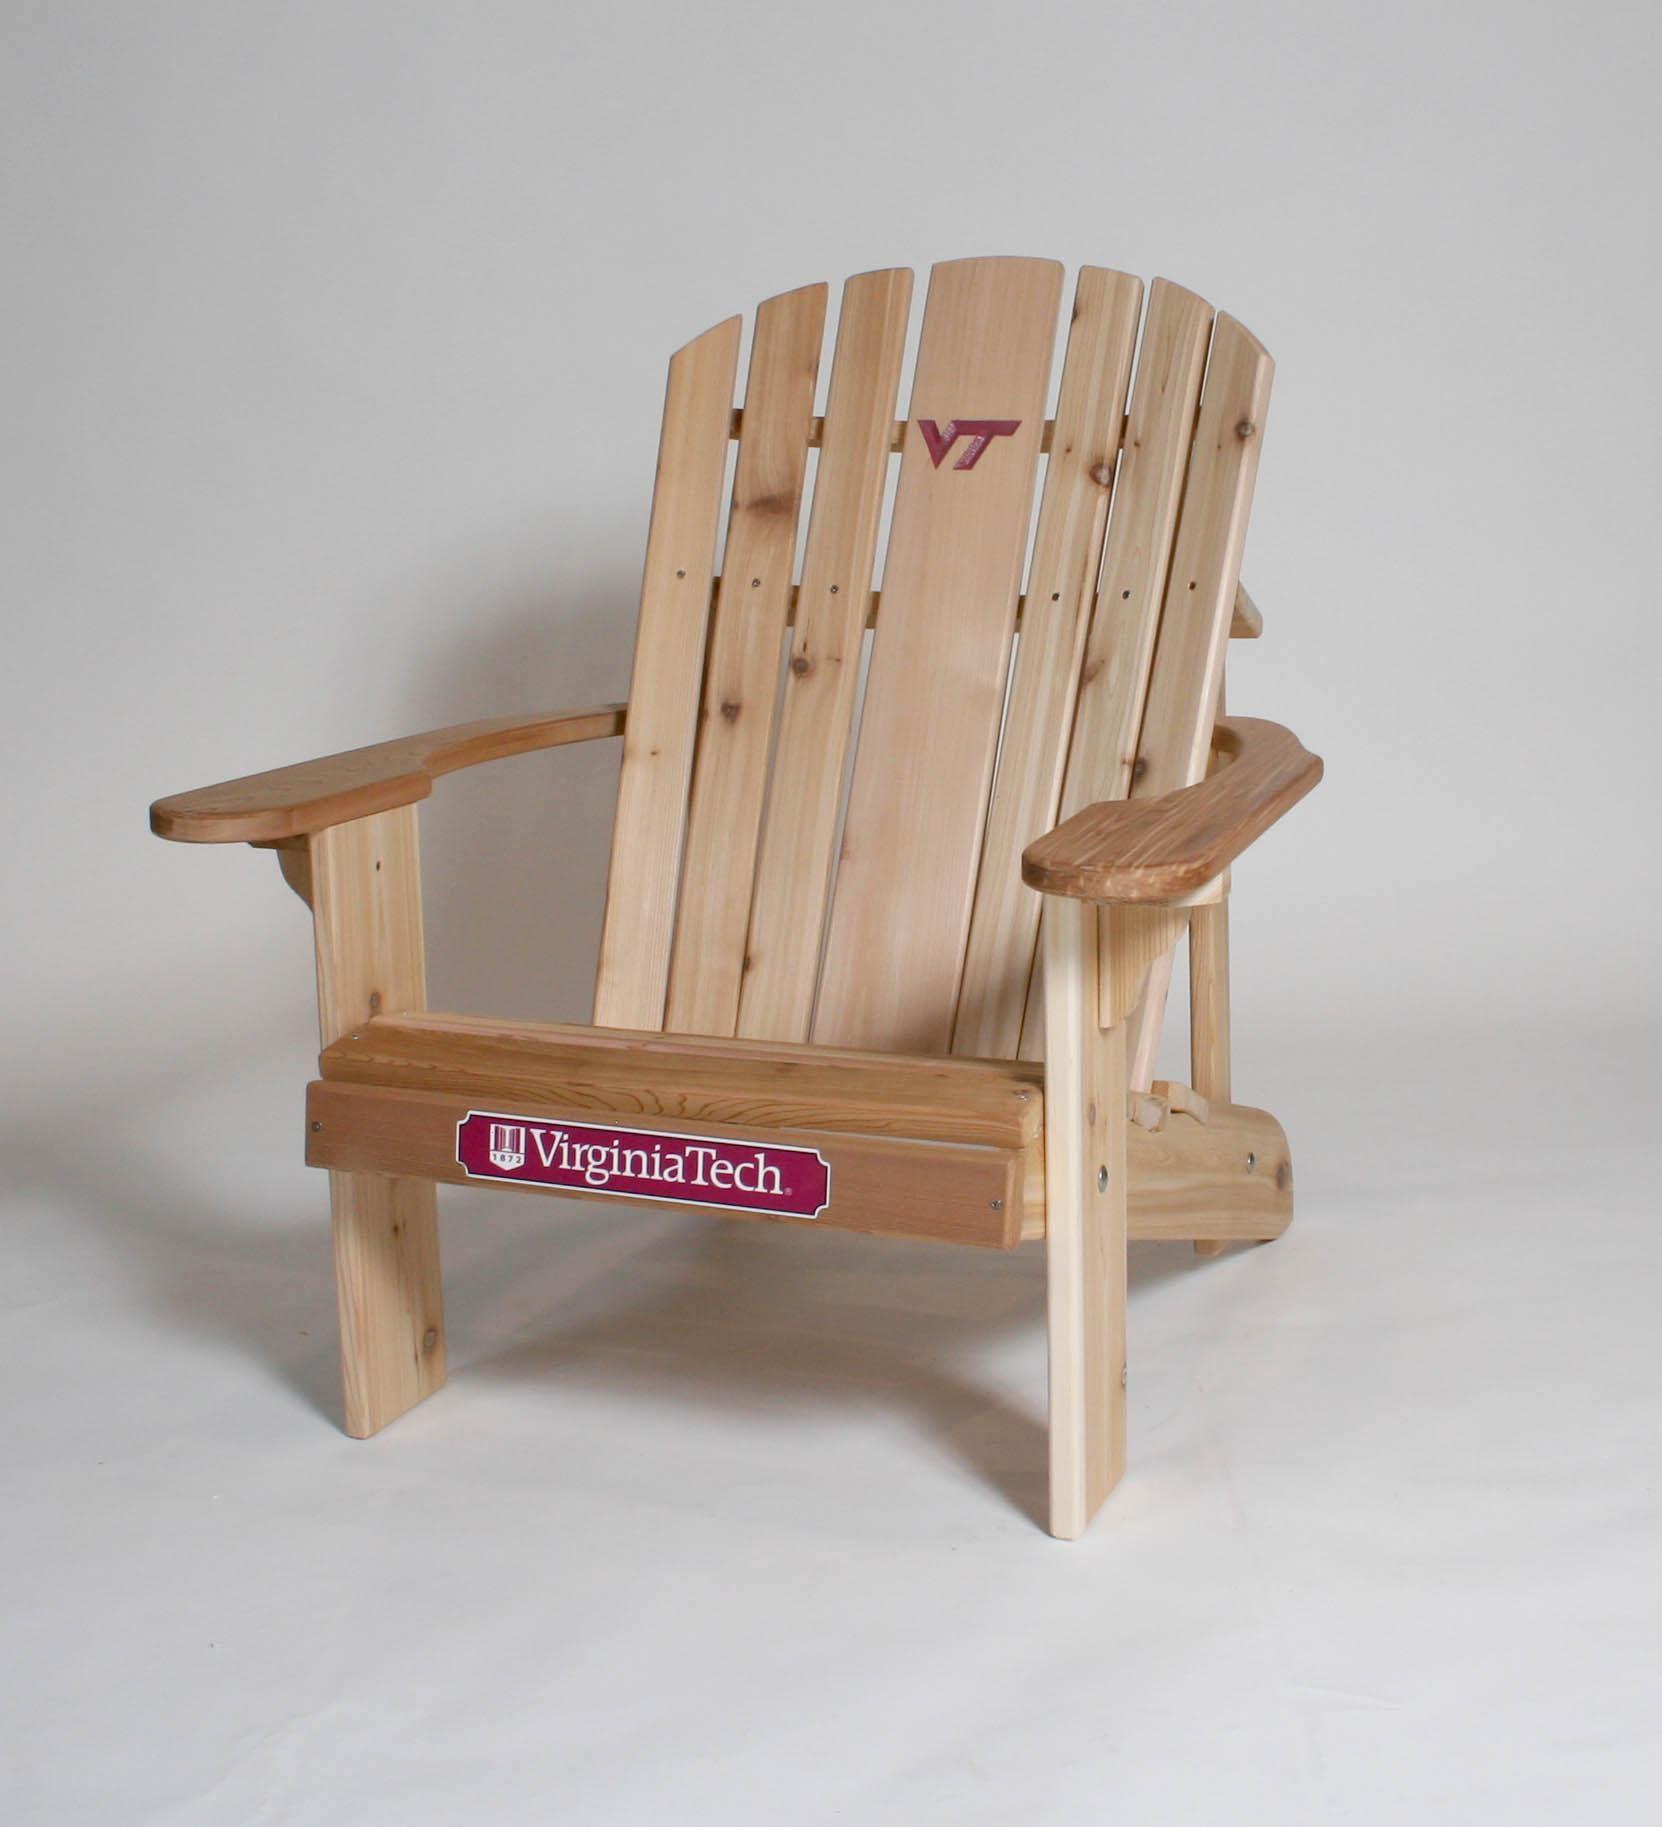 Adirondack Chair Of Virginia Tech